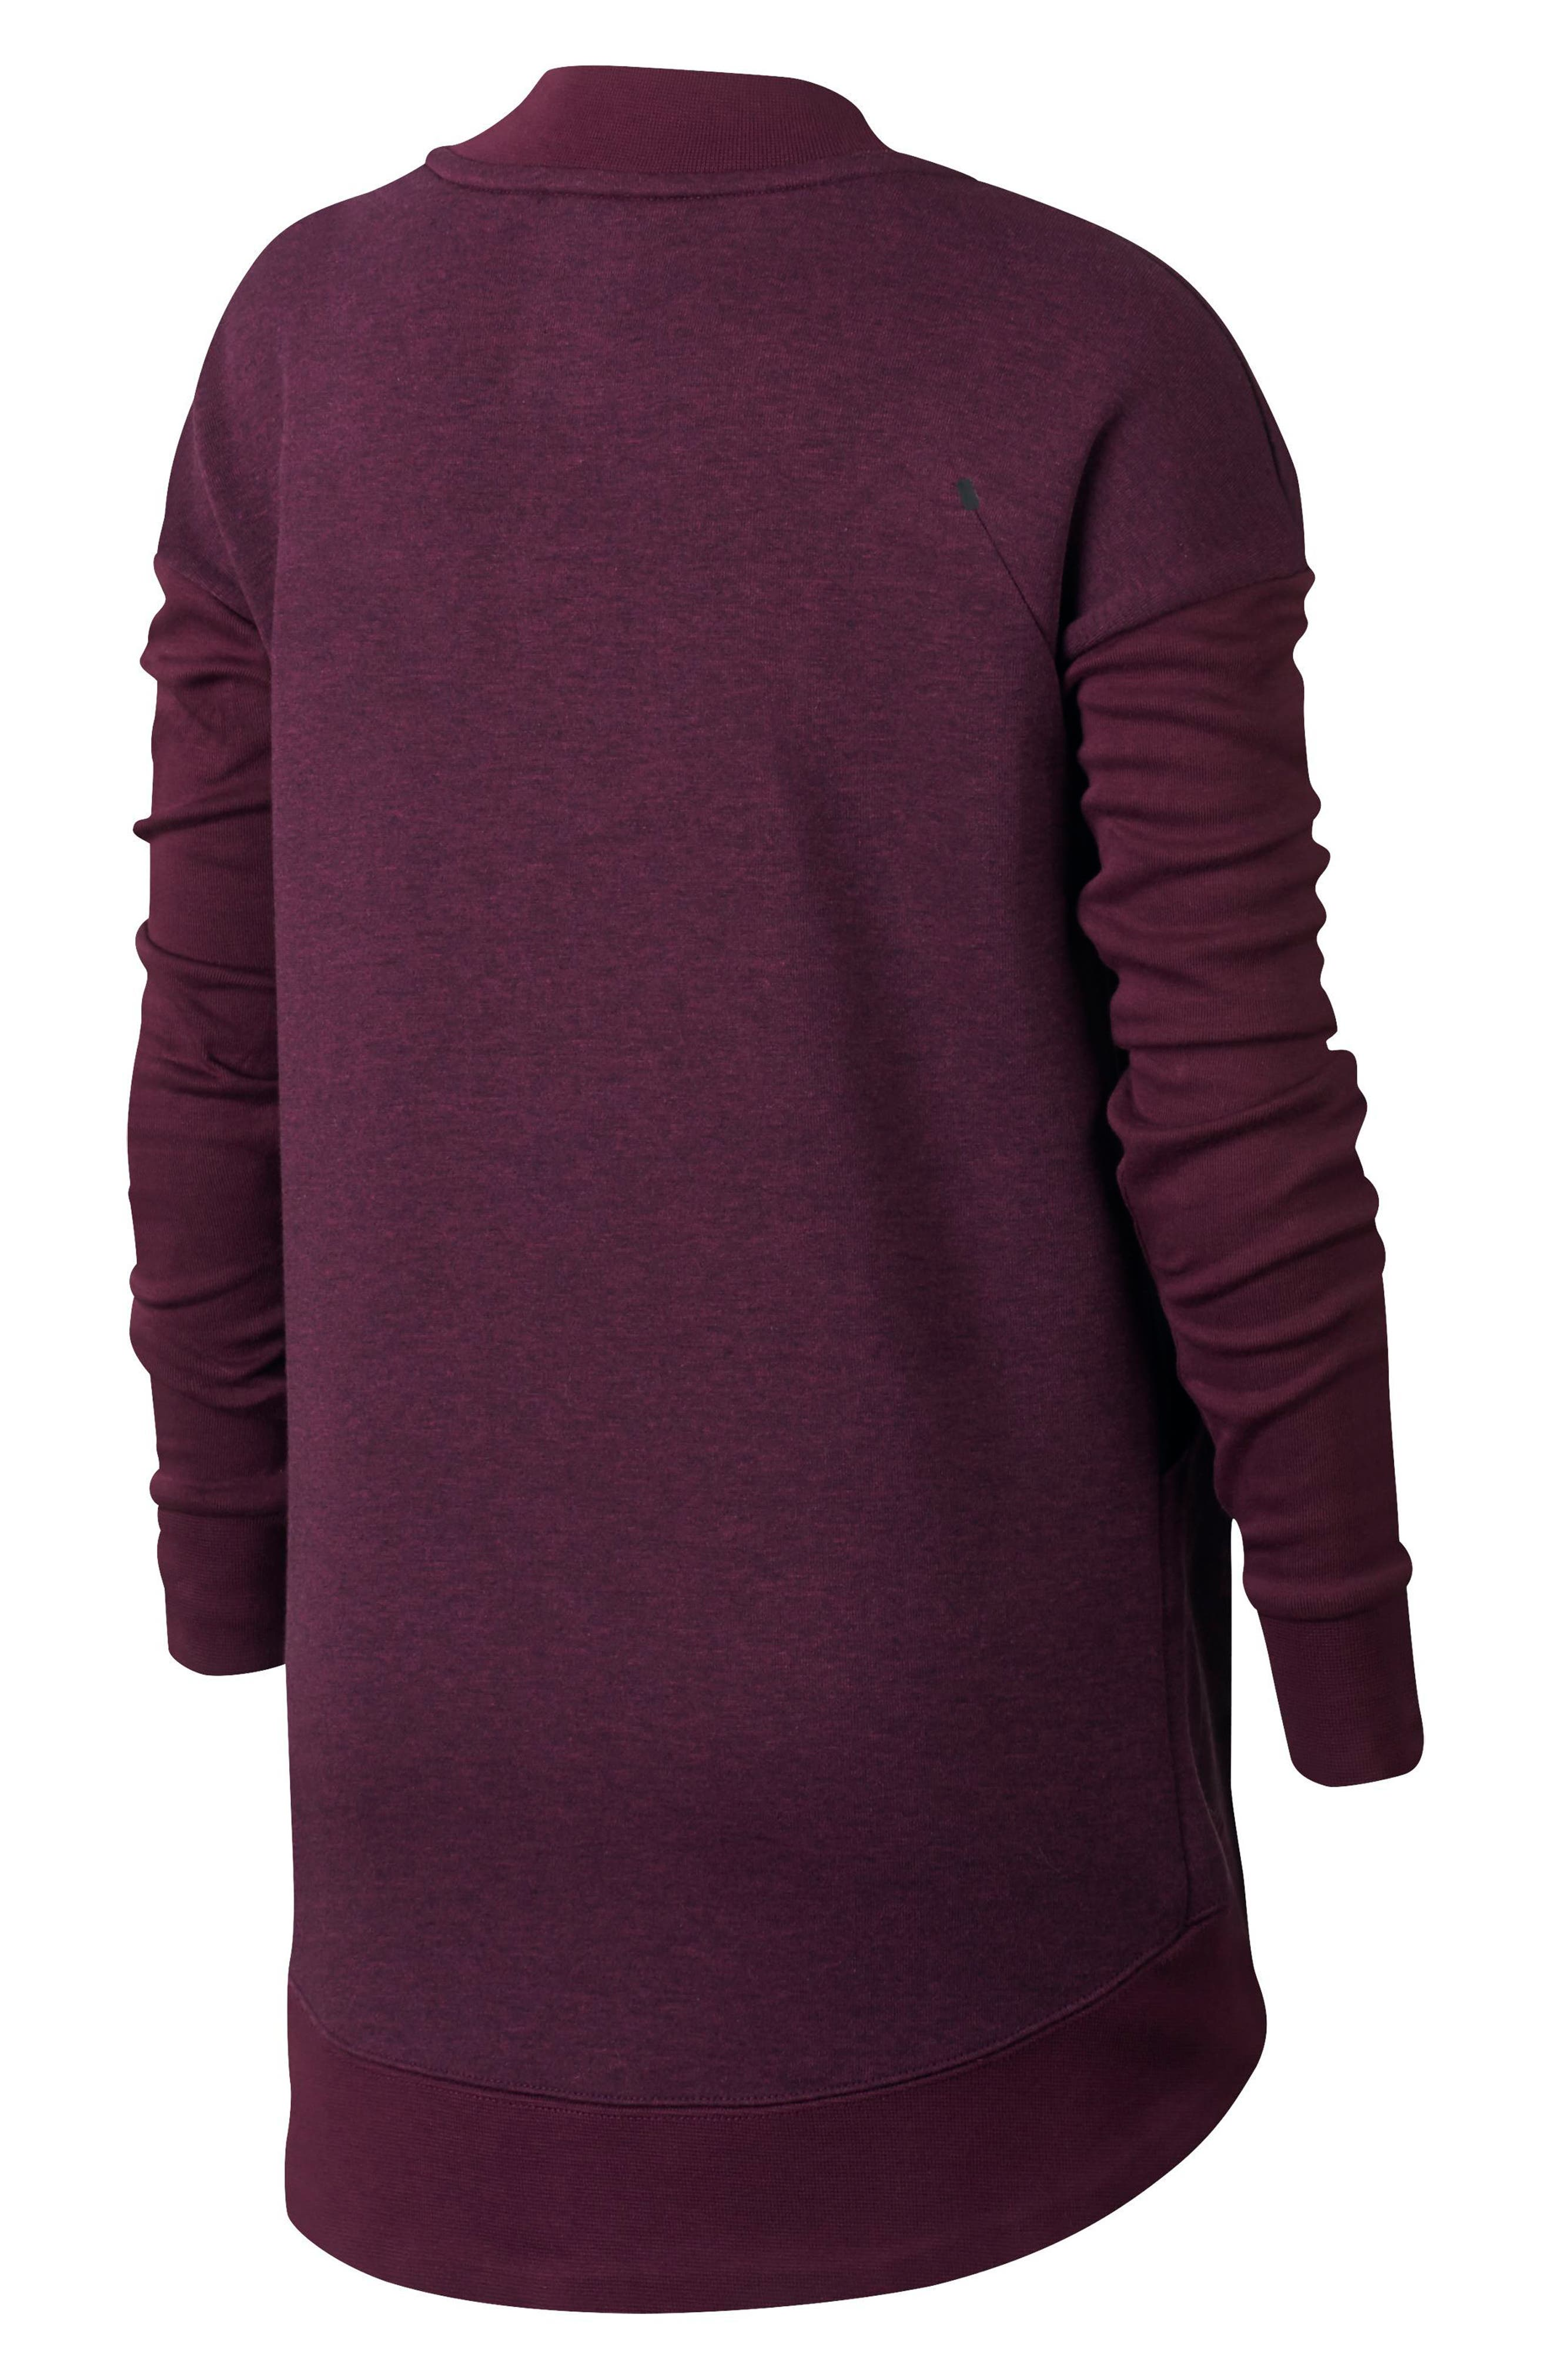 Tech Fleece Zip Jacket,                             Alternate thumbnail 2, color,                             609